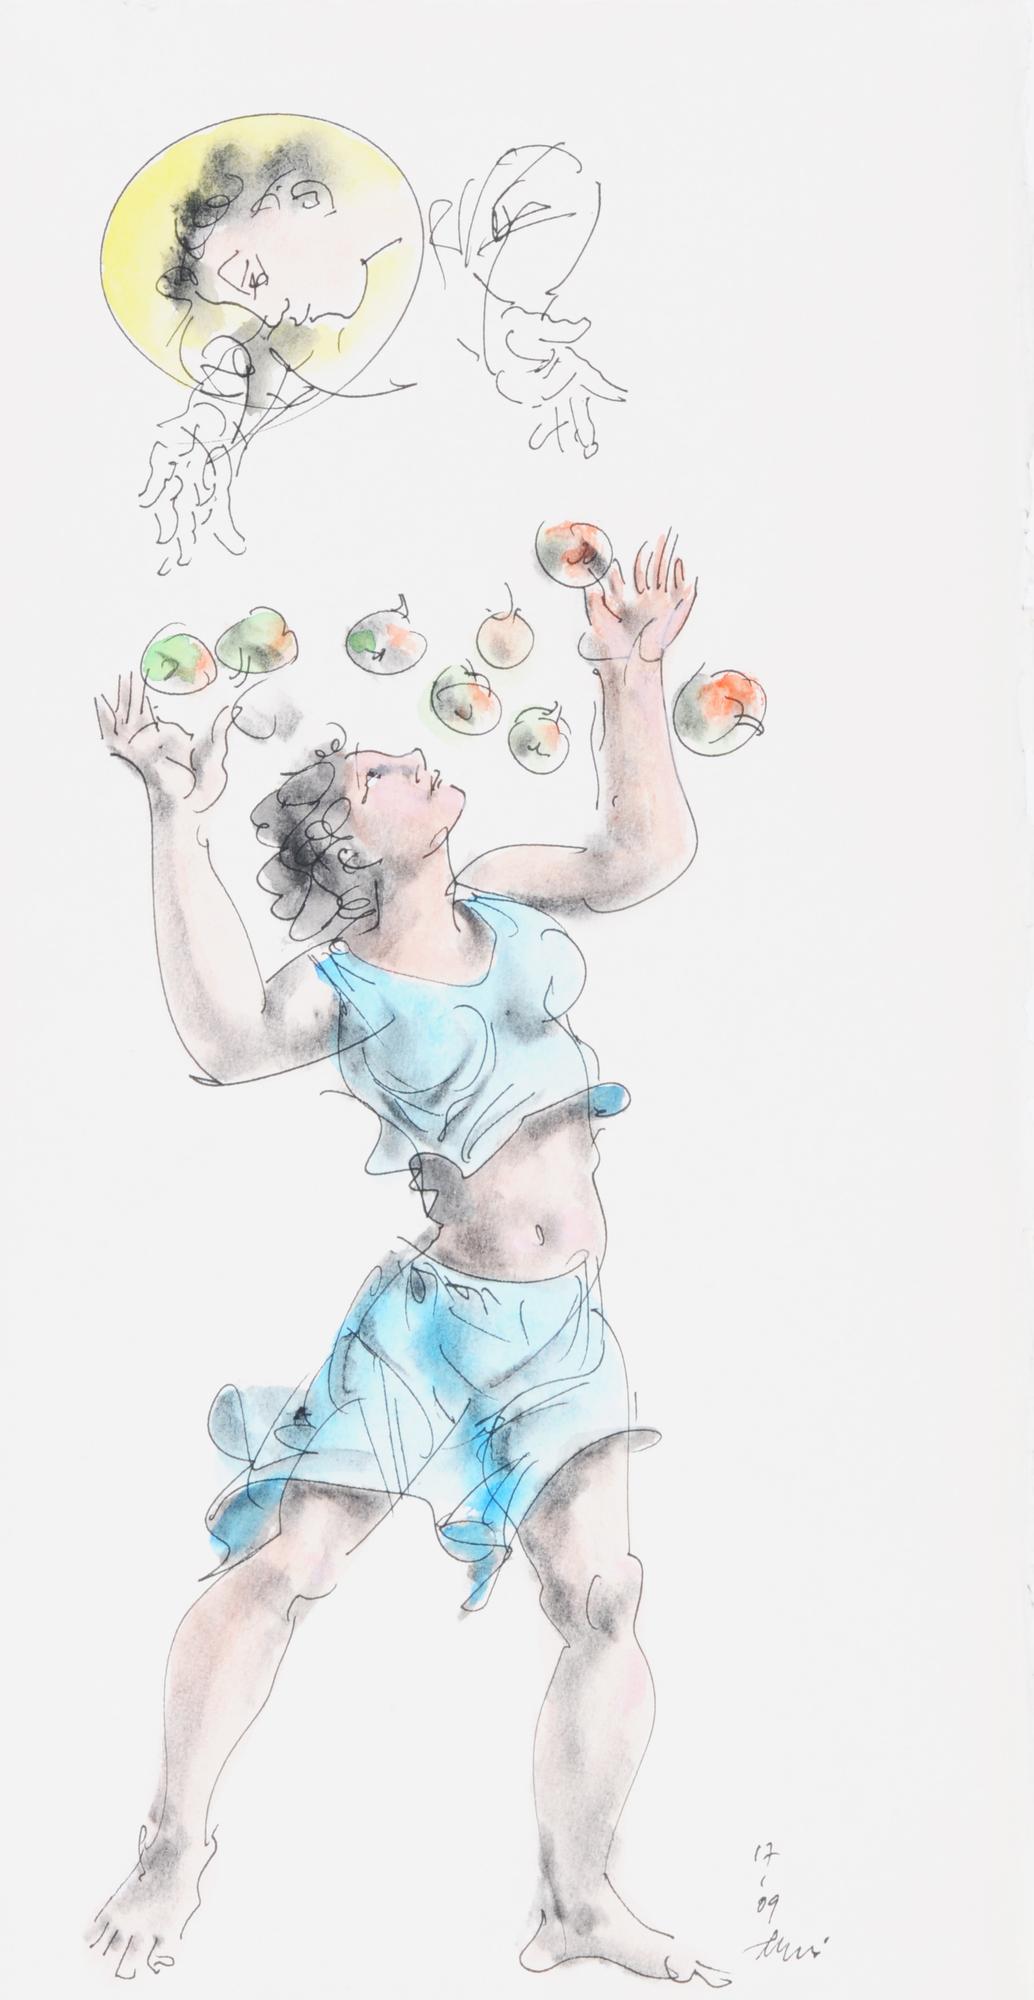 Erni Hans, Junge Frau beim Auffangen von Äpfeln (Young Woman catching Apples)